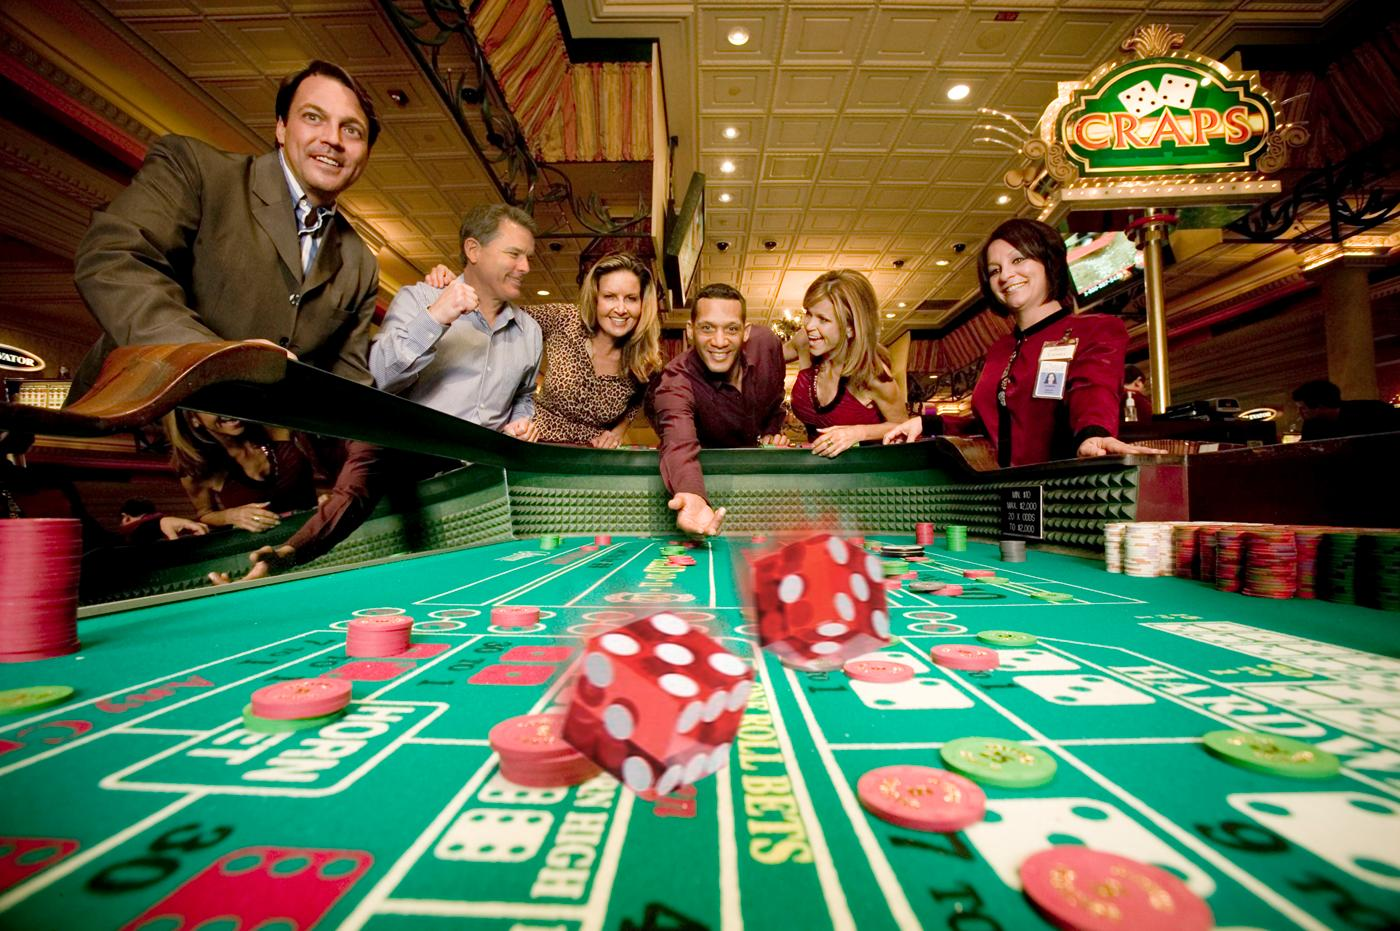 Jeux casino : gagner surement